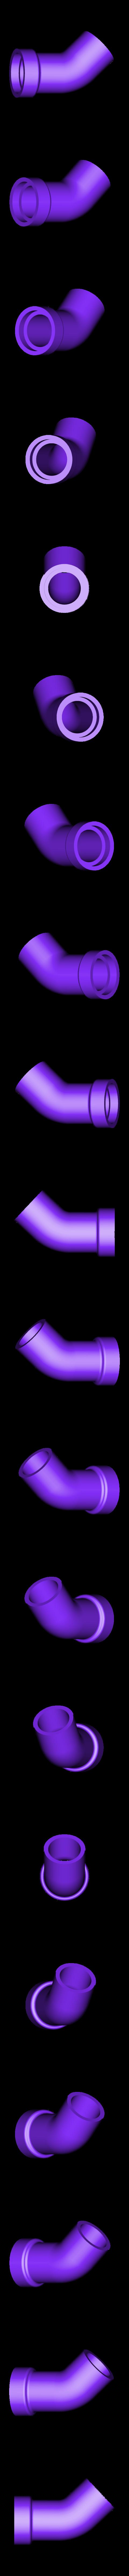 Stoker_Pipe_2.STL Download free STL file 4-8-8-4 Big Boy Locomotive • 3D printer object, RaymondDeLuca